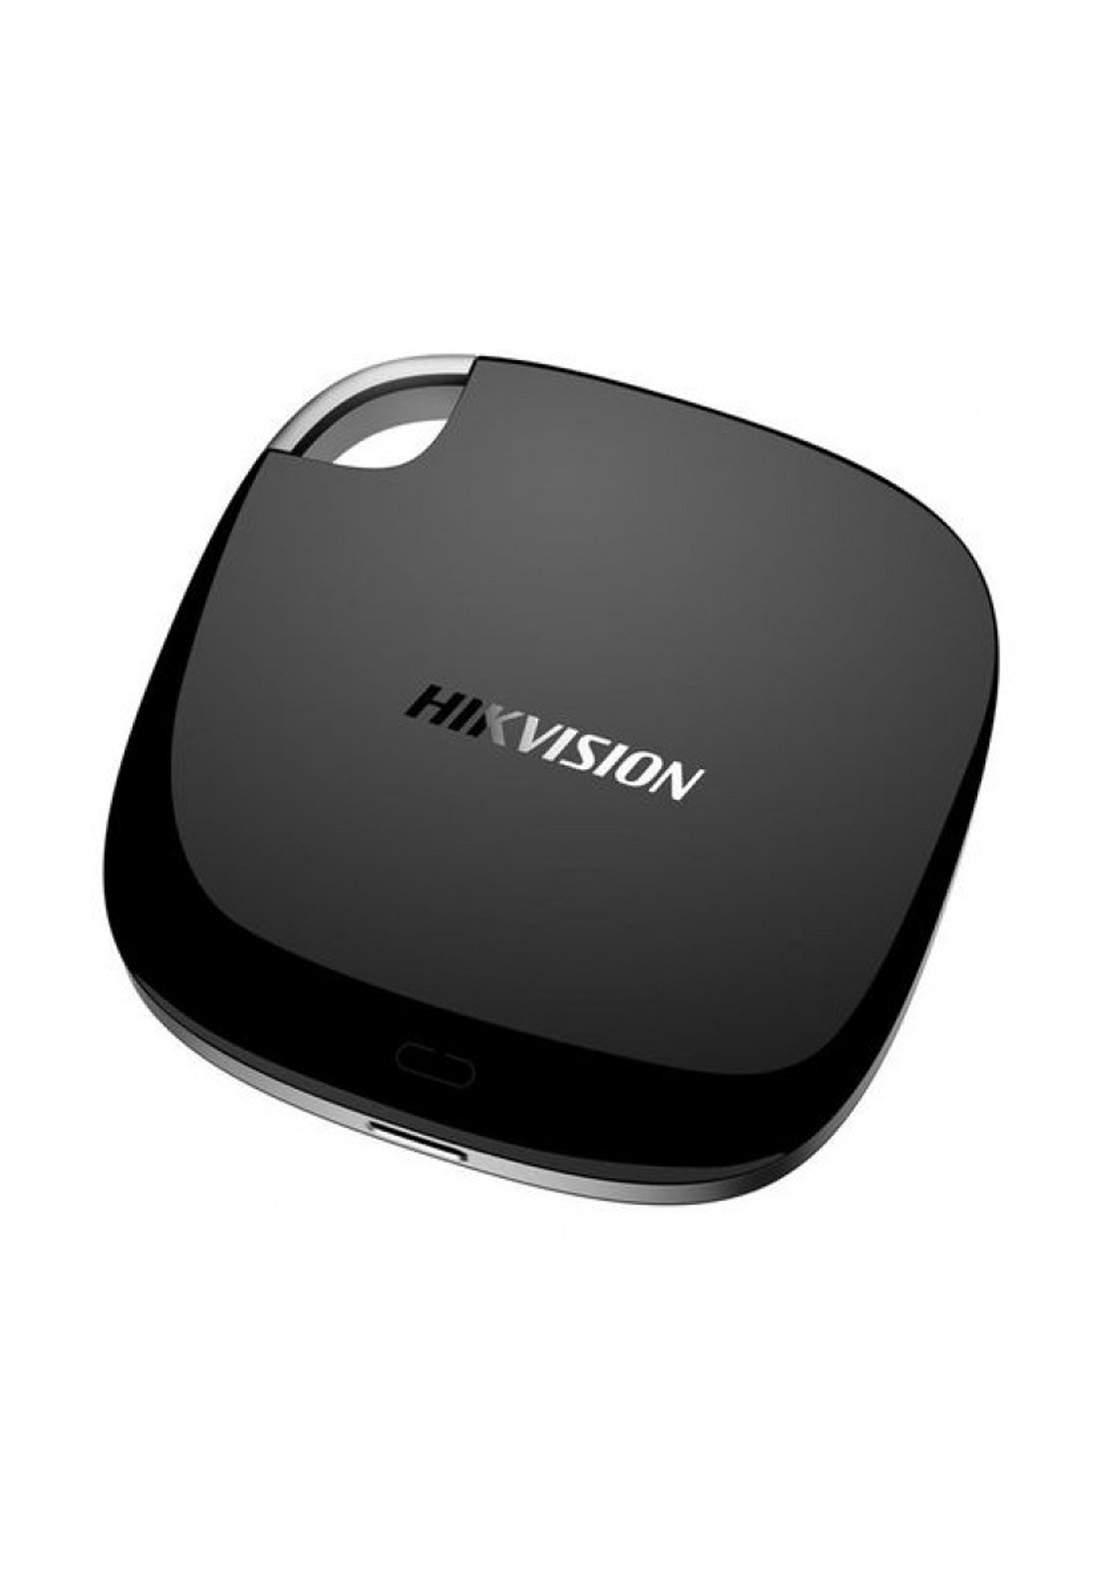 Hikvision T100I Portable SSD 512GB - USB 3.1 External Solid State Drive - Black هارد خارجي